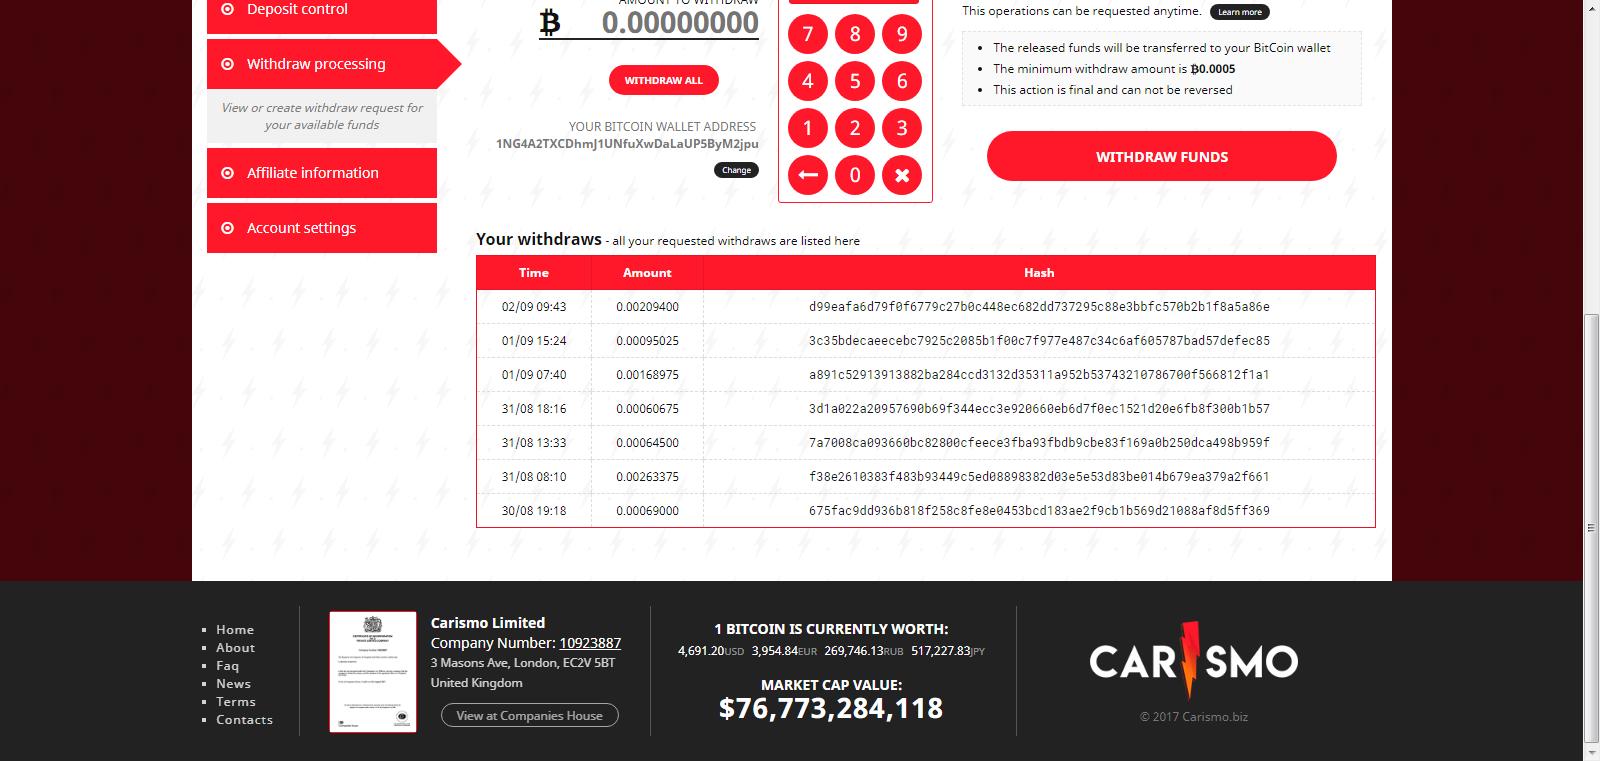 Carismo - BitCoin trading bots